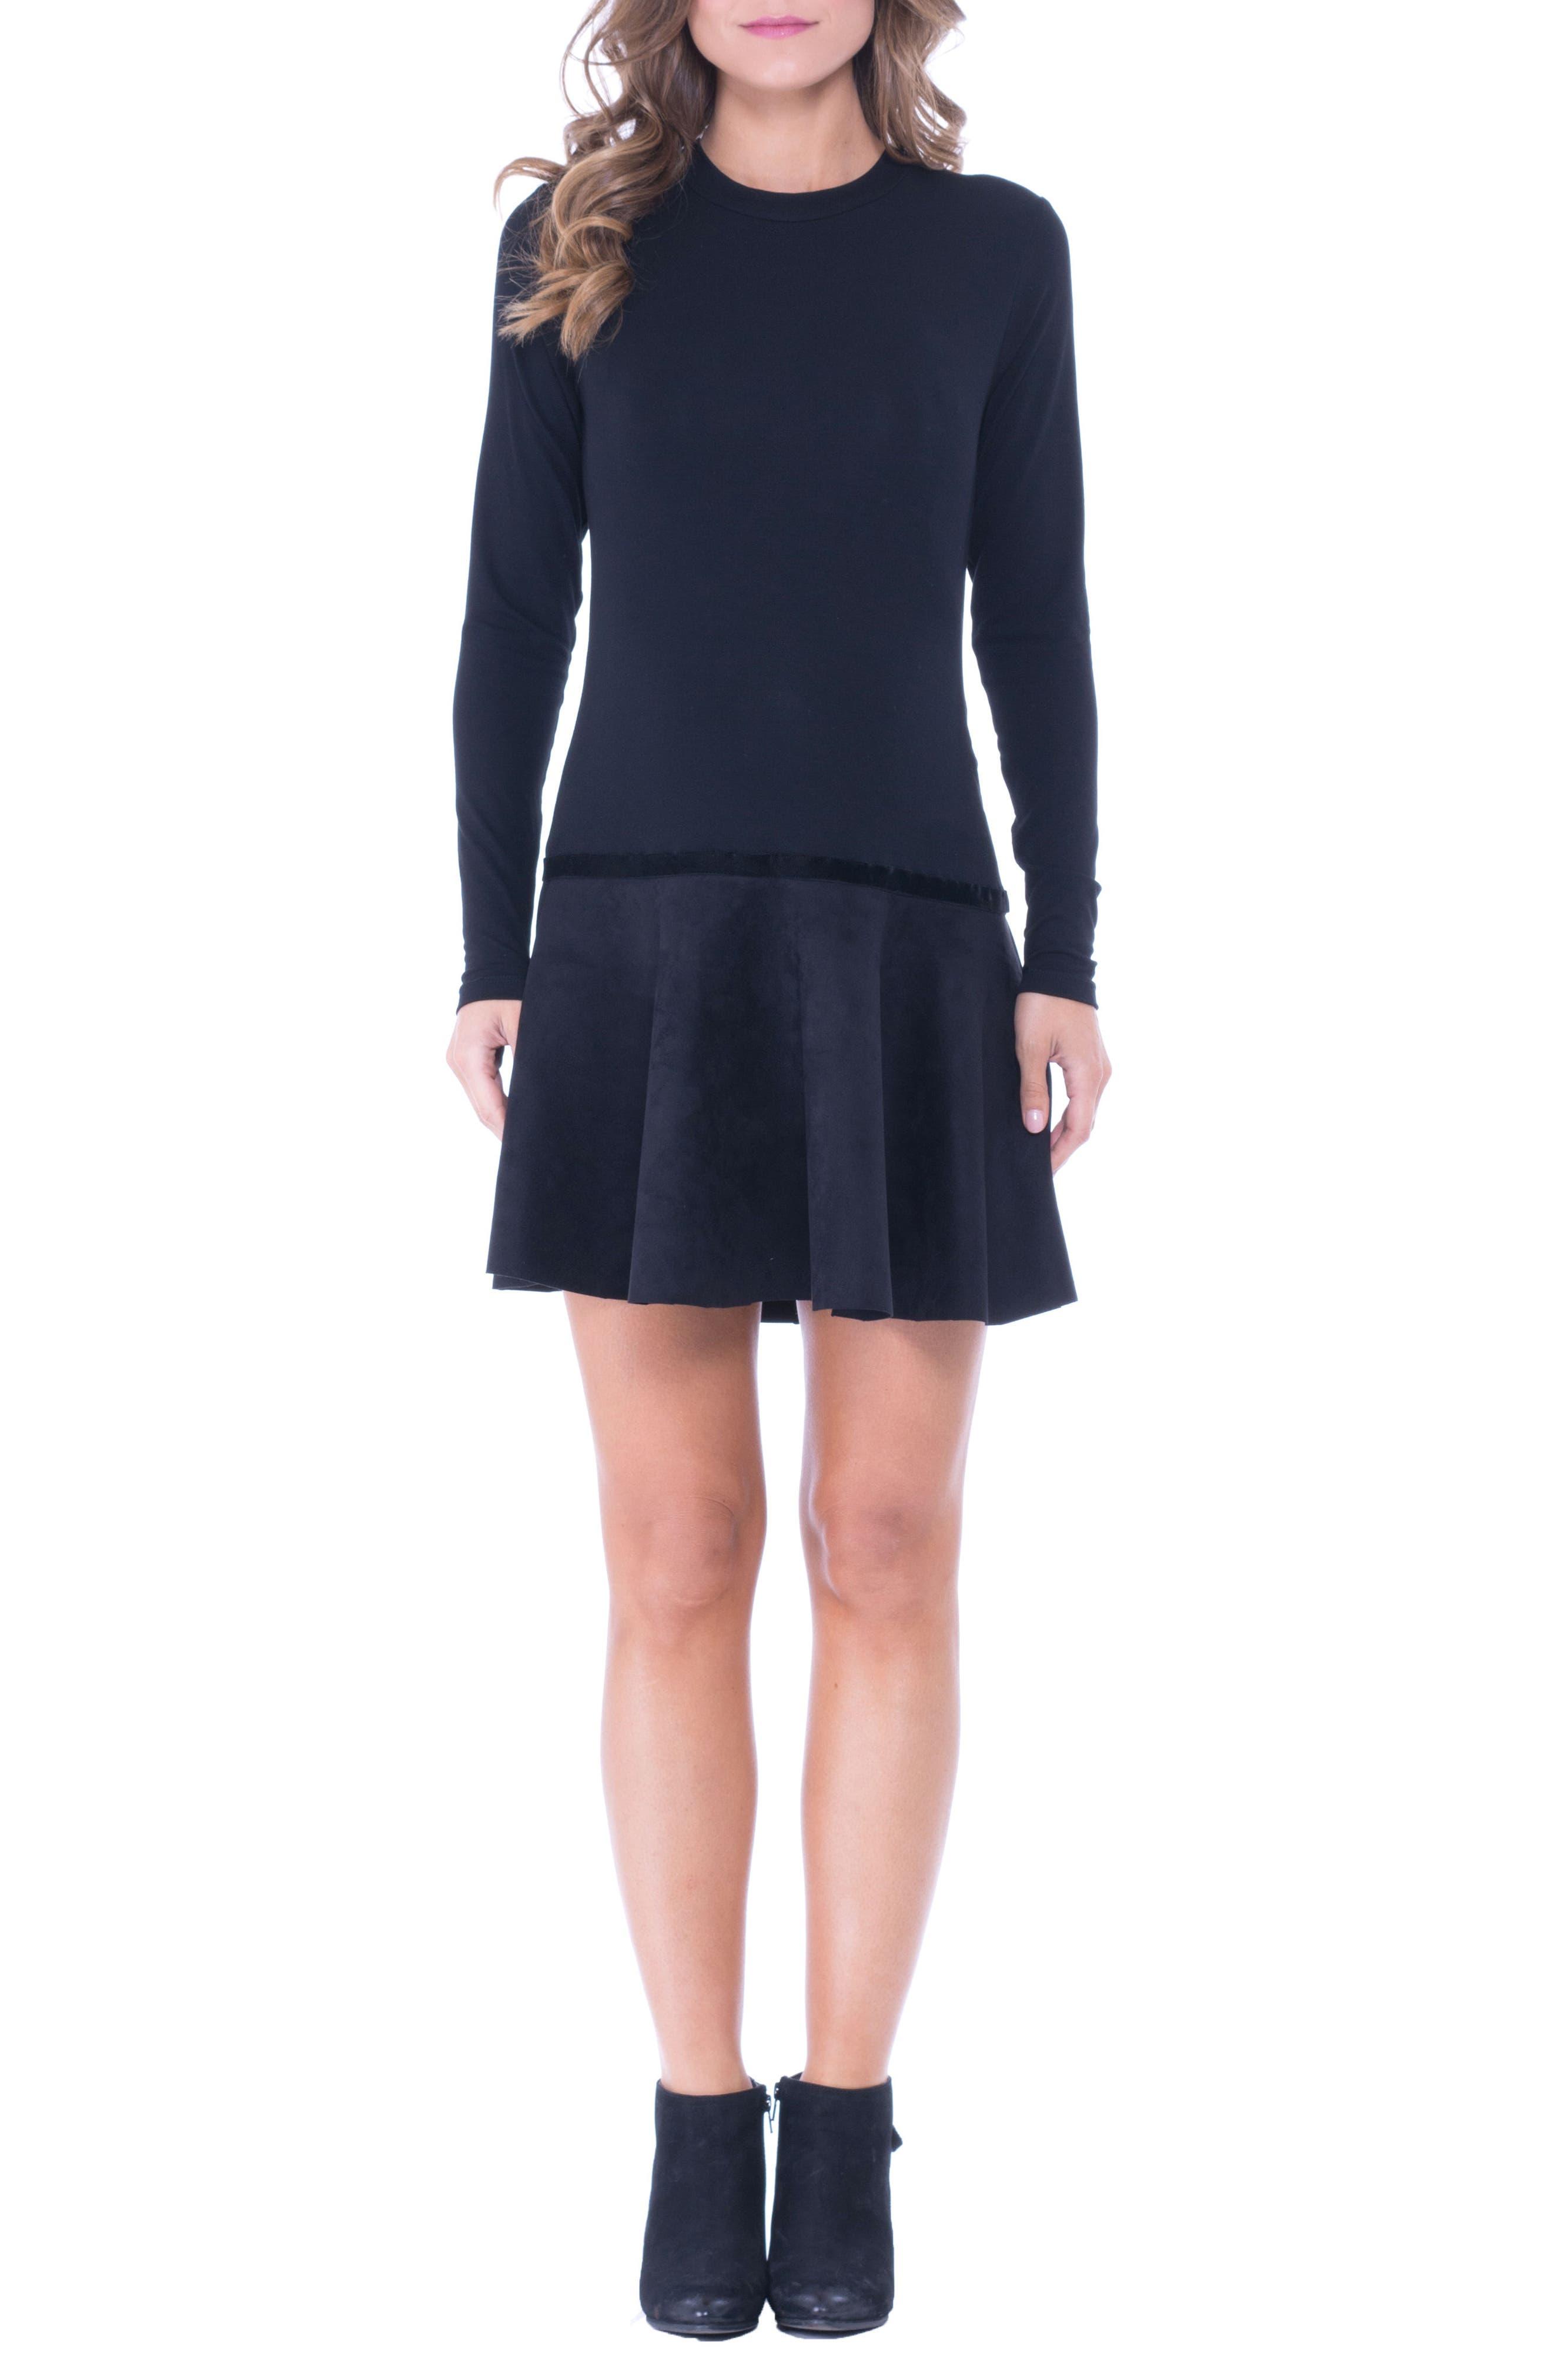 Alternate Image 1 Selected - Olian Faux Suede Skirt Maternity Skater Dress